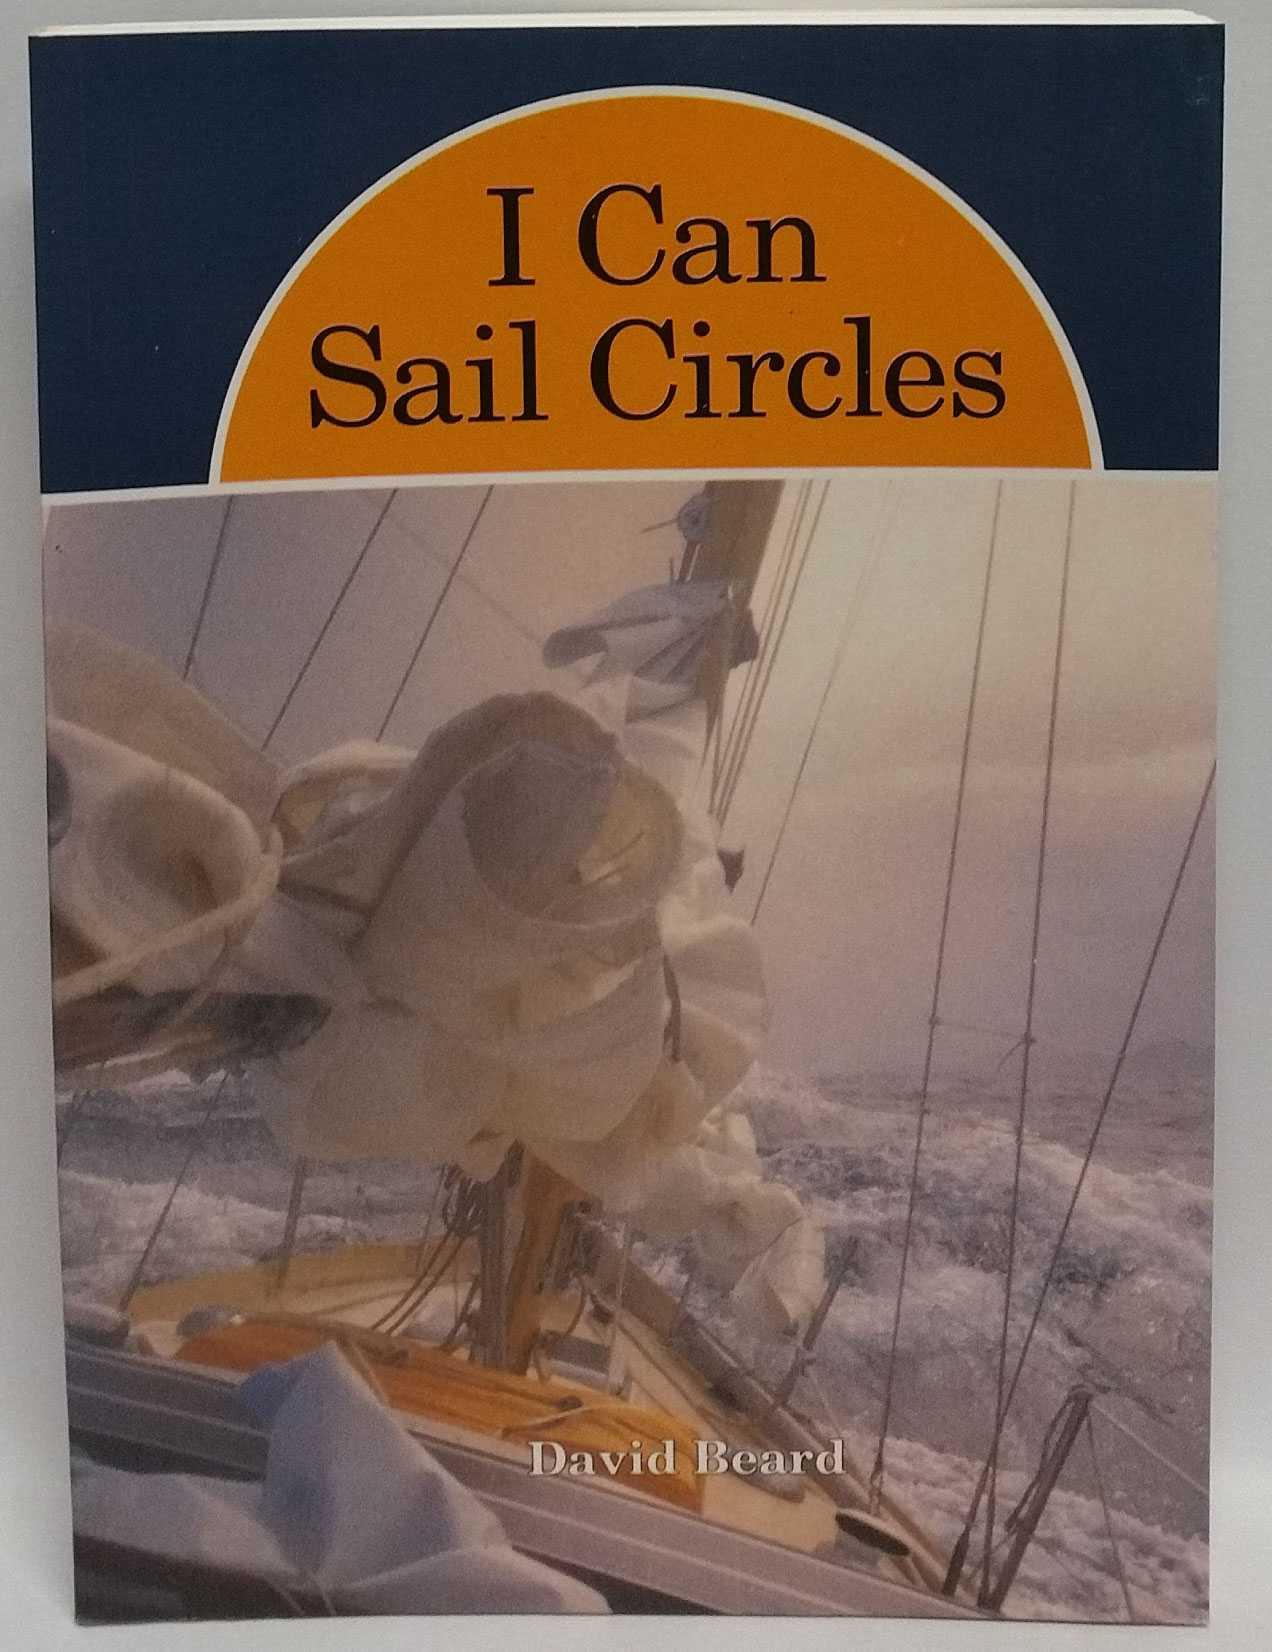 I Can Sail Circles, David Beard